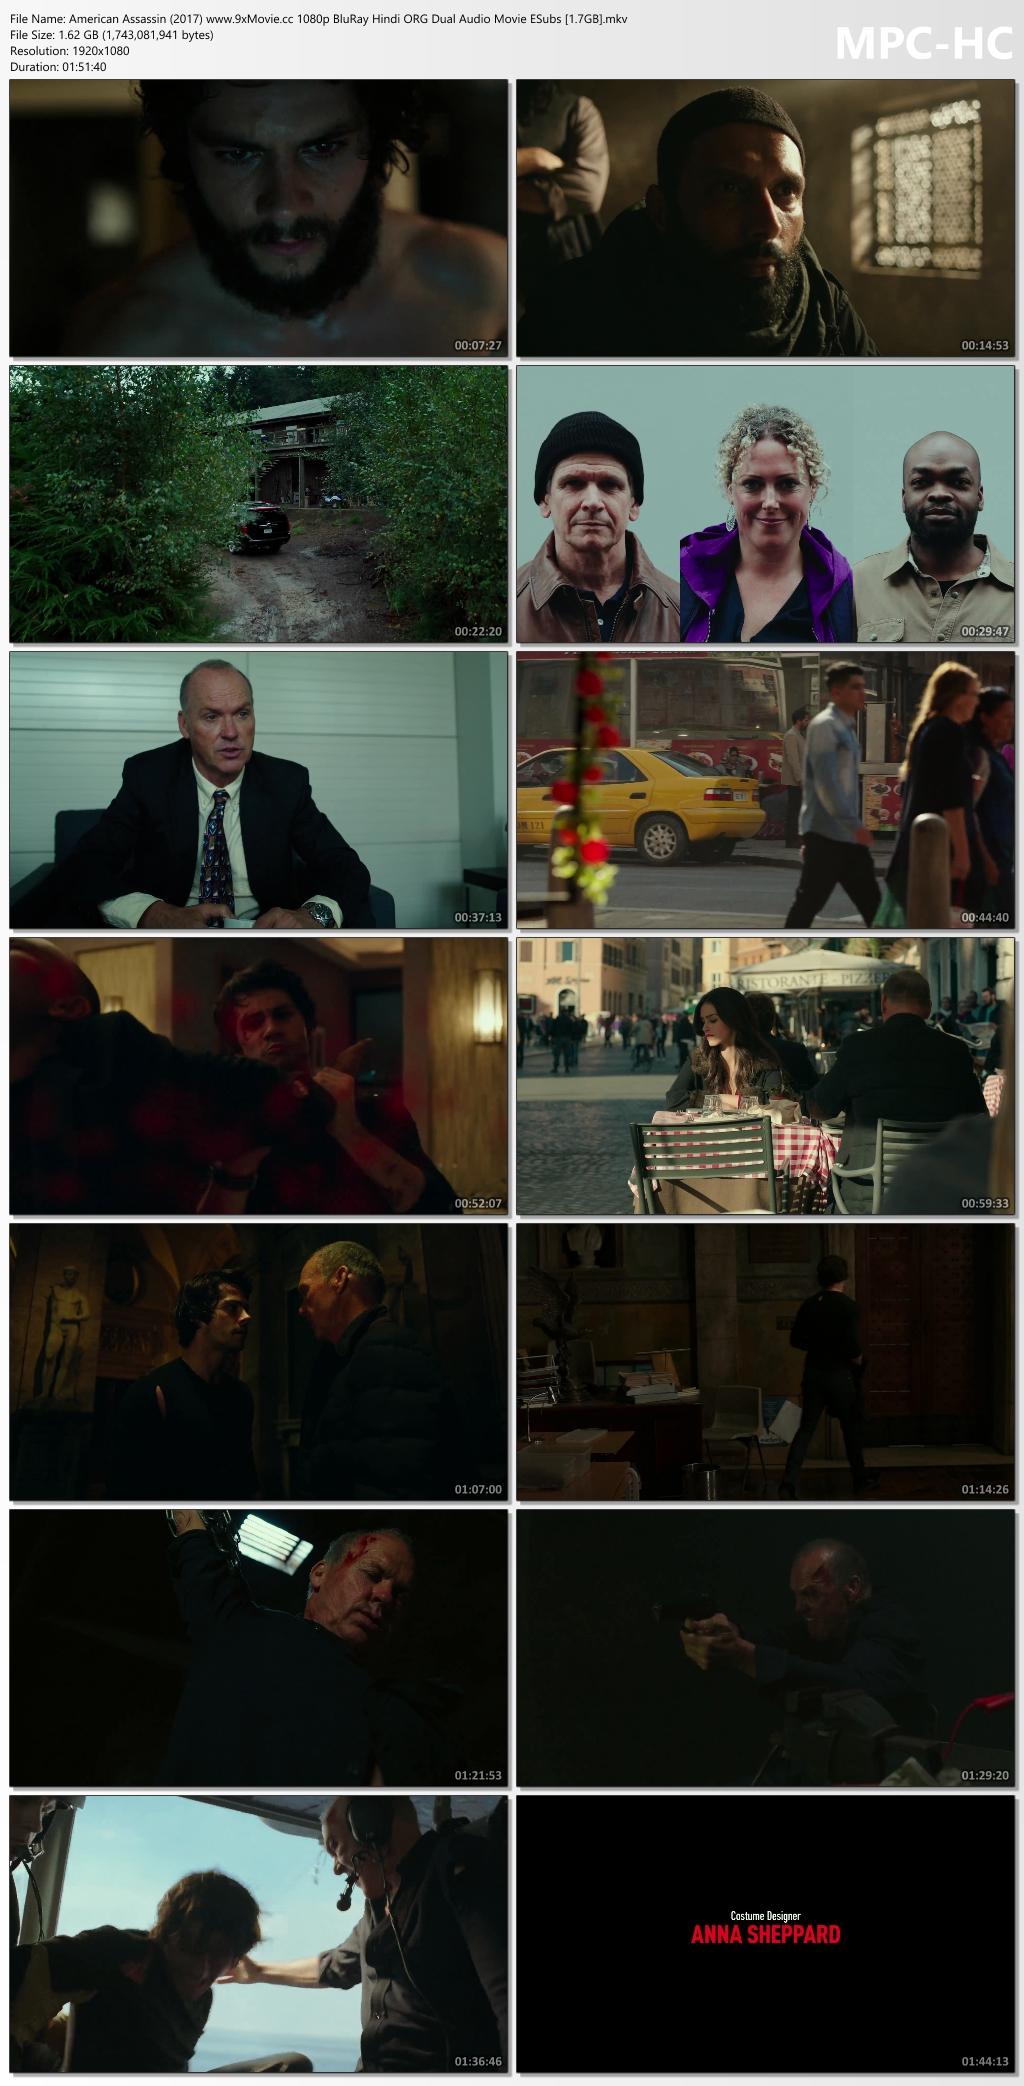 American-Assassin-2017-www-9x-Movie-cc-1080p-Blu-Ray-Hindi-ORG-Dual-Audio-Movie-ESubs-1-7-GB-mkv